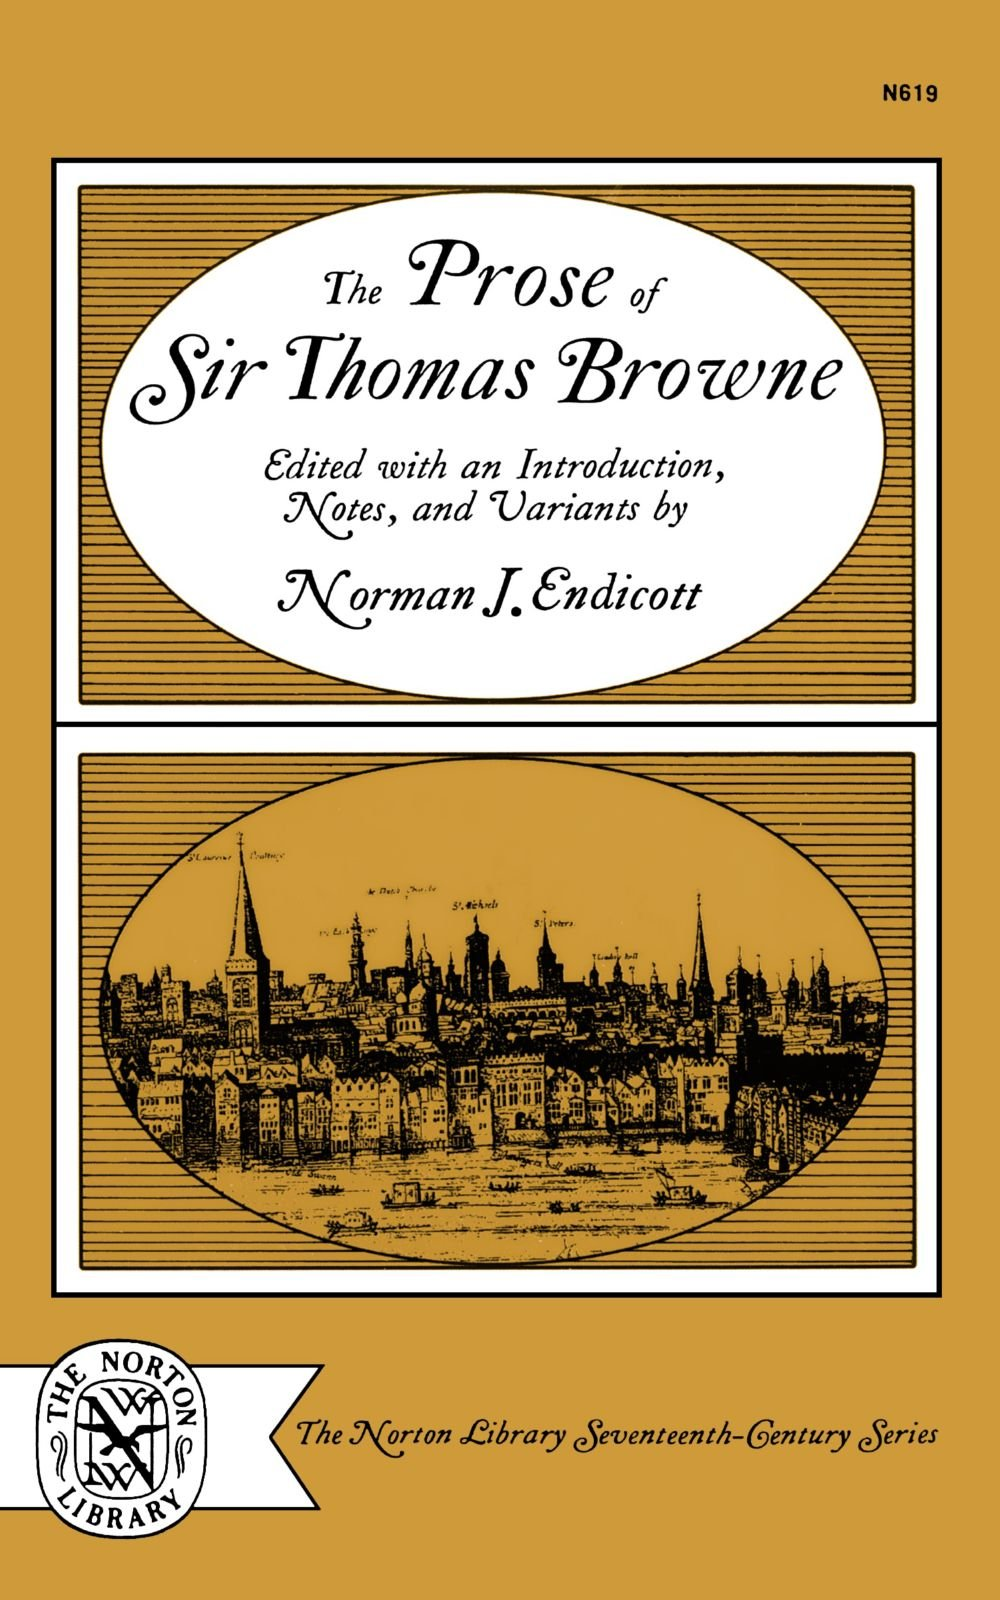 Amazon.com: The Prose of Sir Thomas Browne (The Norton Library  Seventeenth-Century Series) (9780393006193): Thomas Browne, Norman J.  Endicott: Books